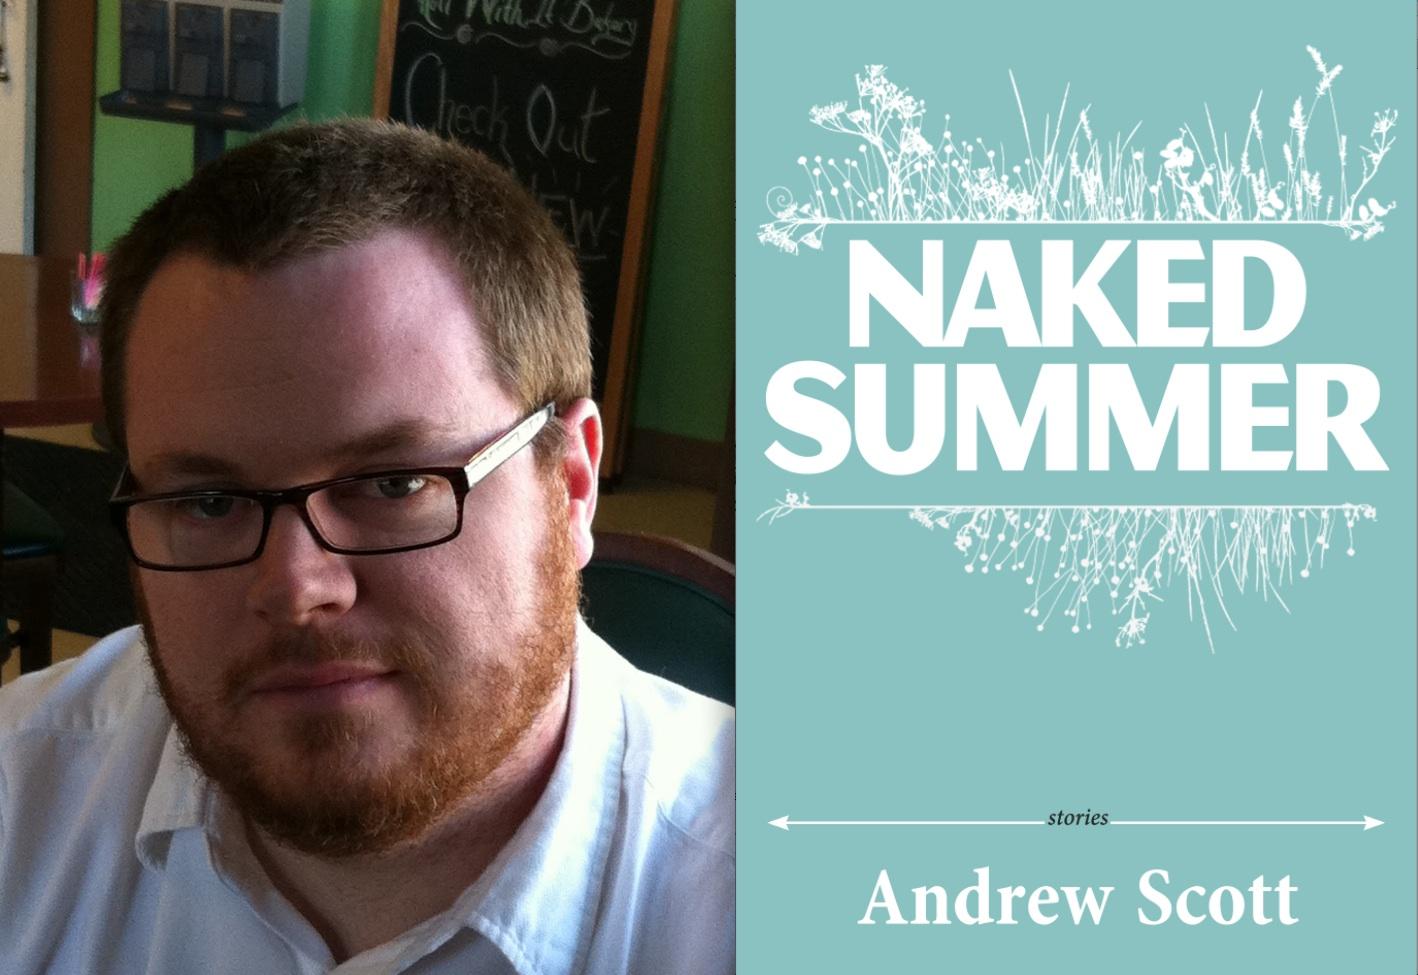 http://2.bp.blogspot.com/-zBNanrXTi9M/TjvNnR3VWdI/AAAAAAAAA4o/LDRQkv4iflE/s1600/scott+naked.jpg